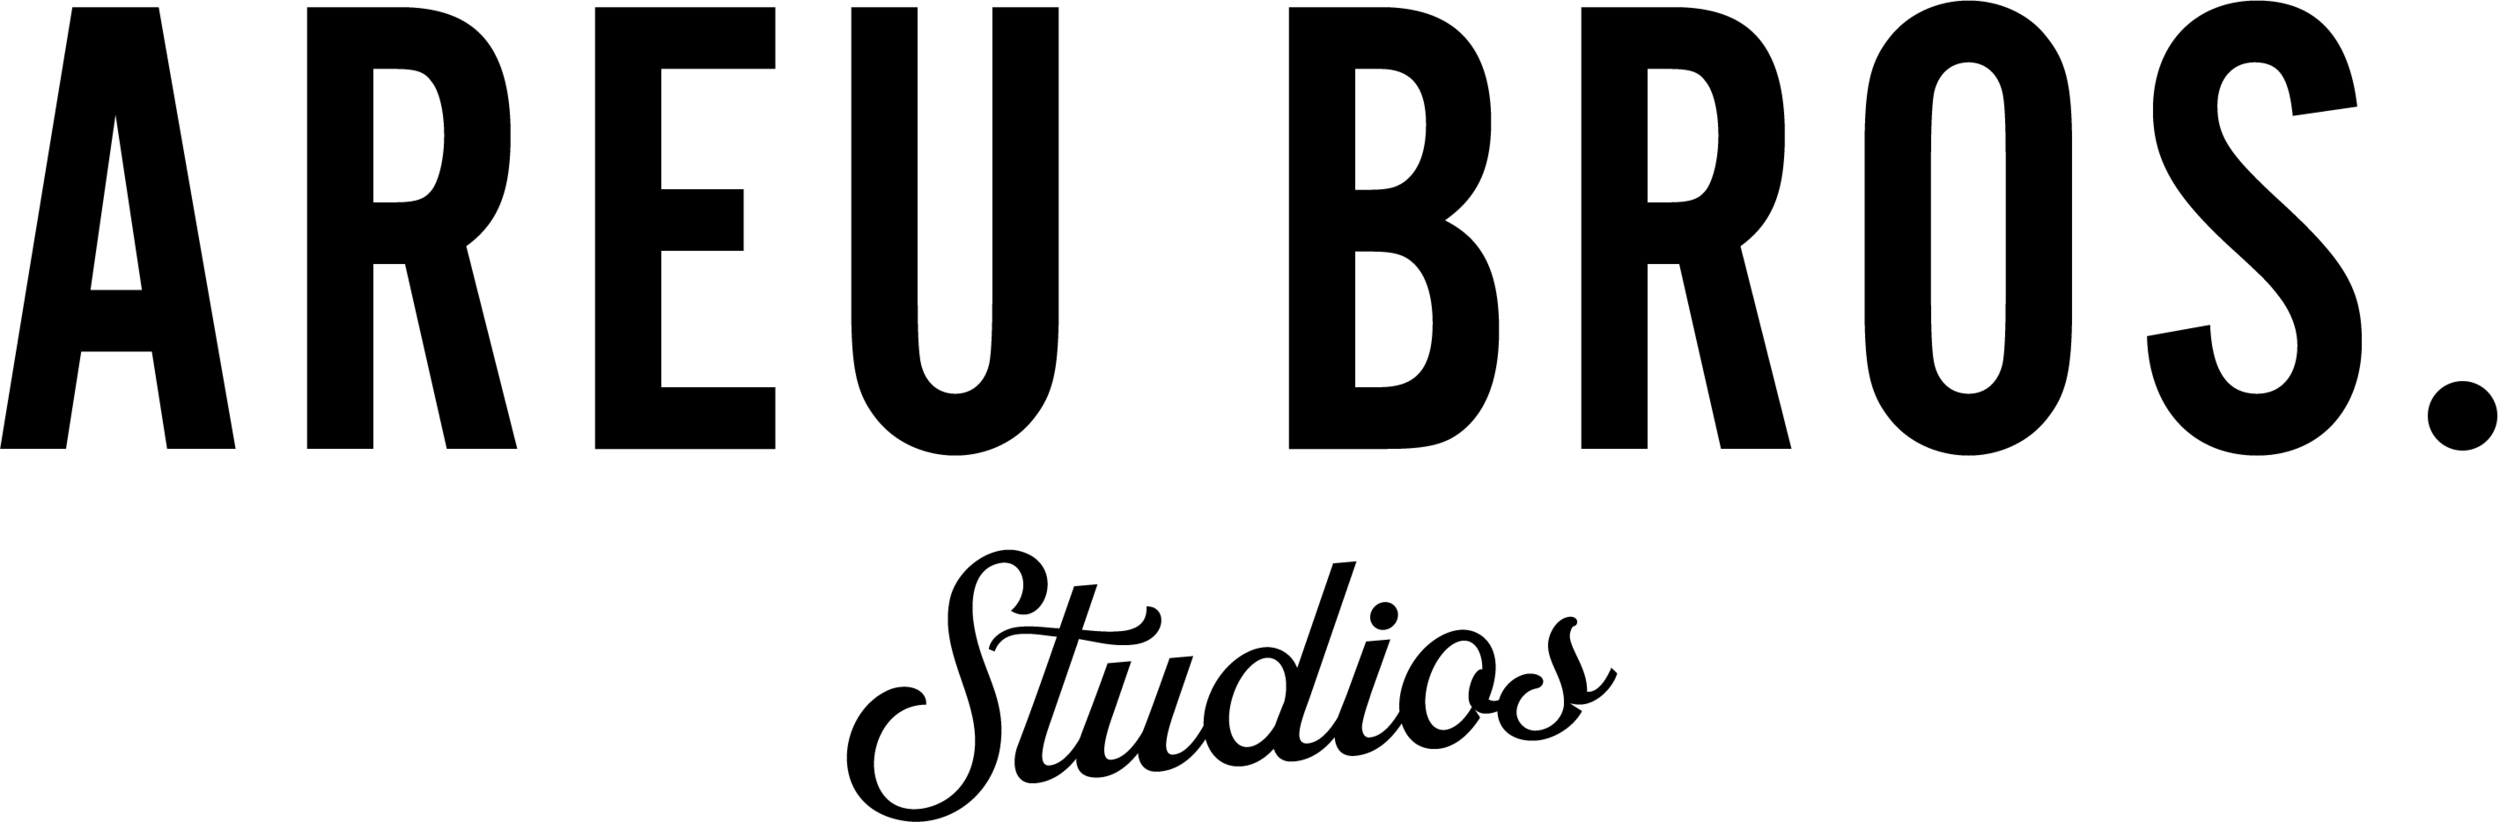 file-2.png